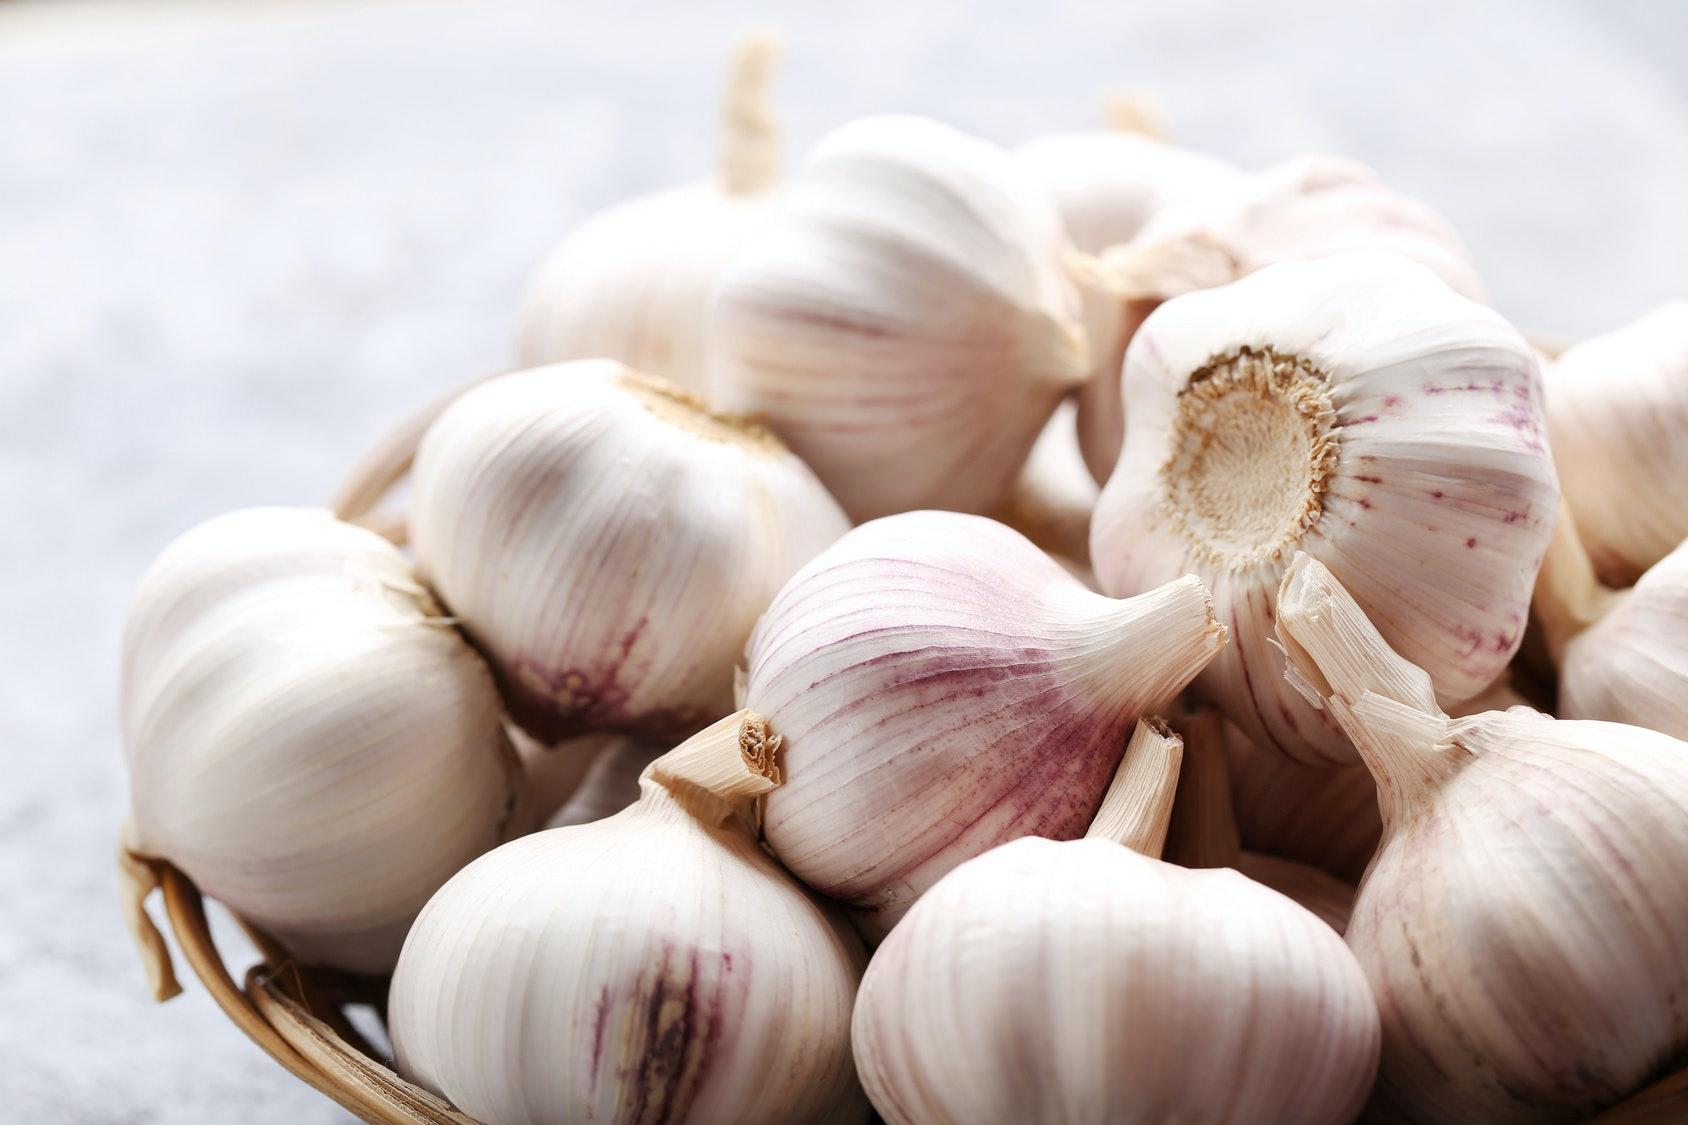 Garlic Has Major Health Benefits, Like Warding Off Acne